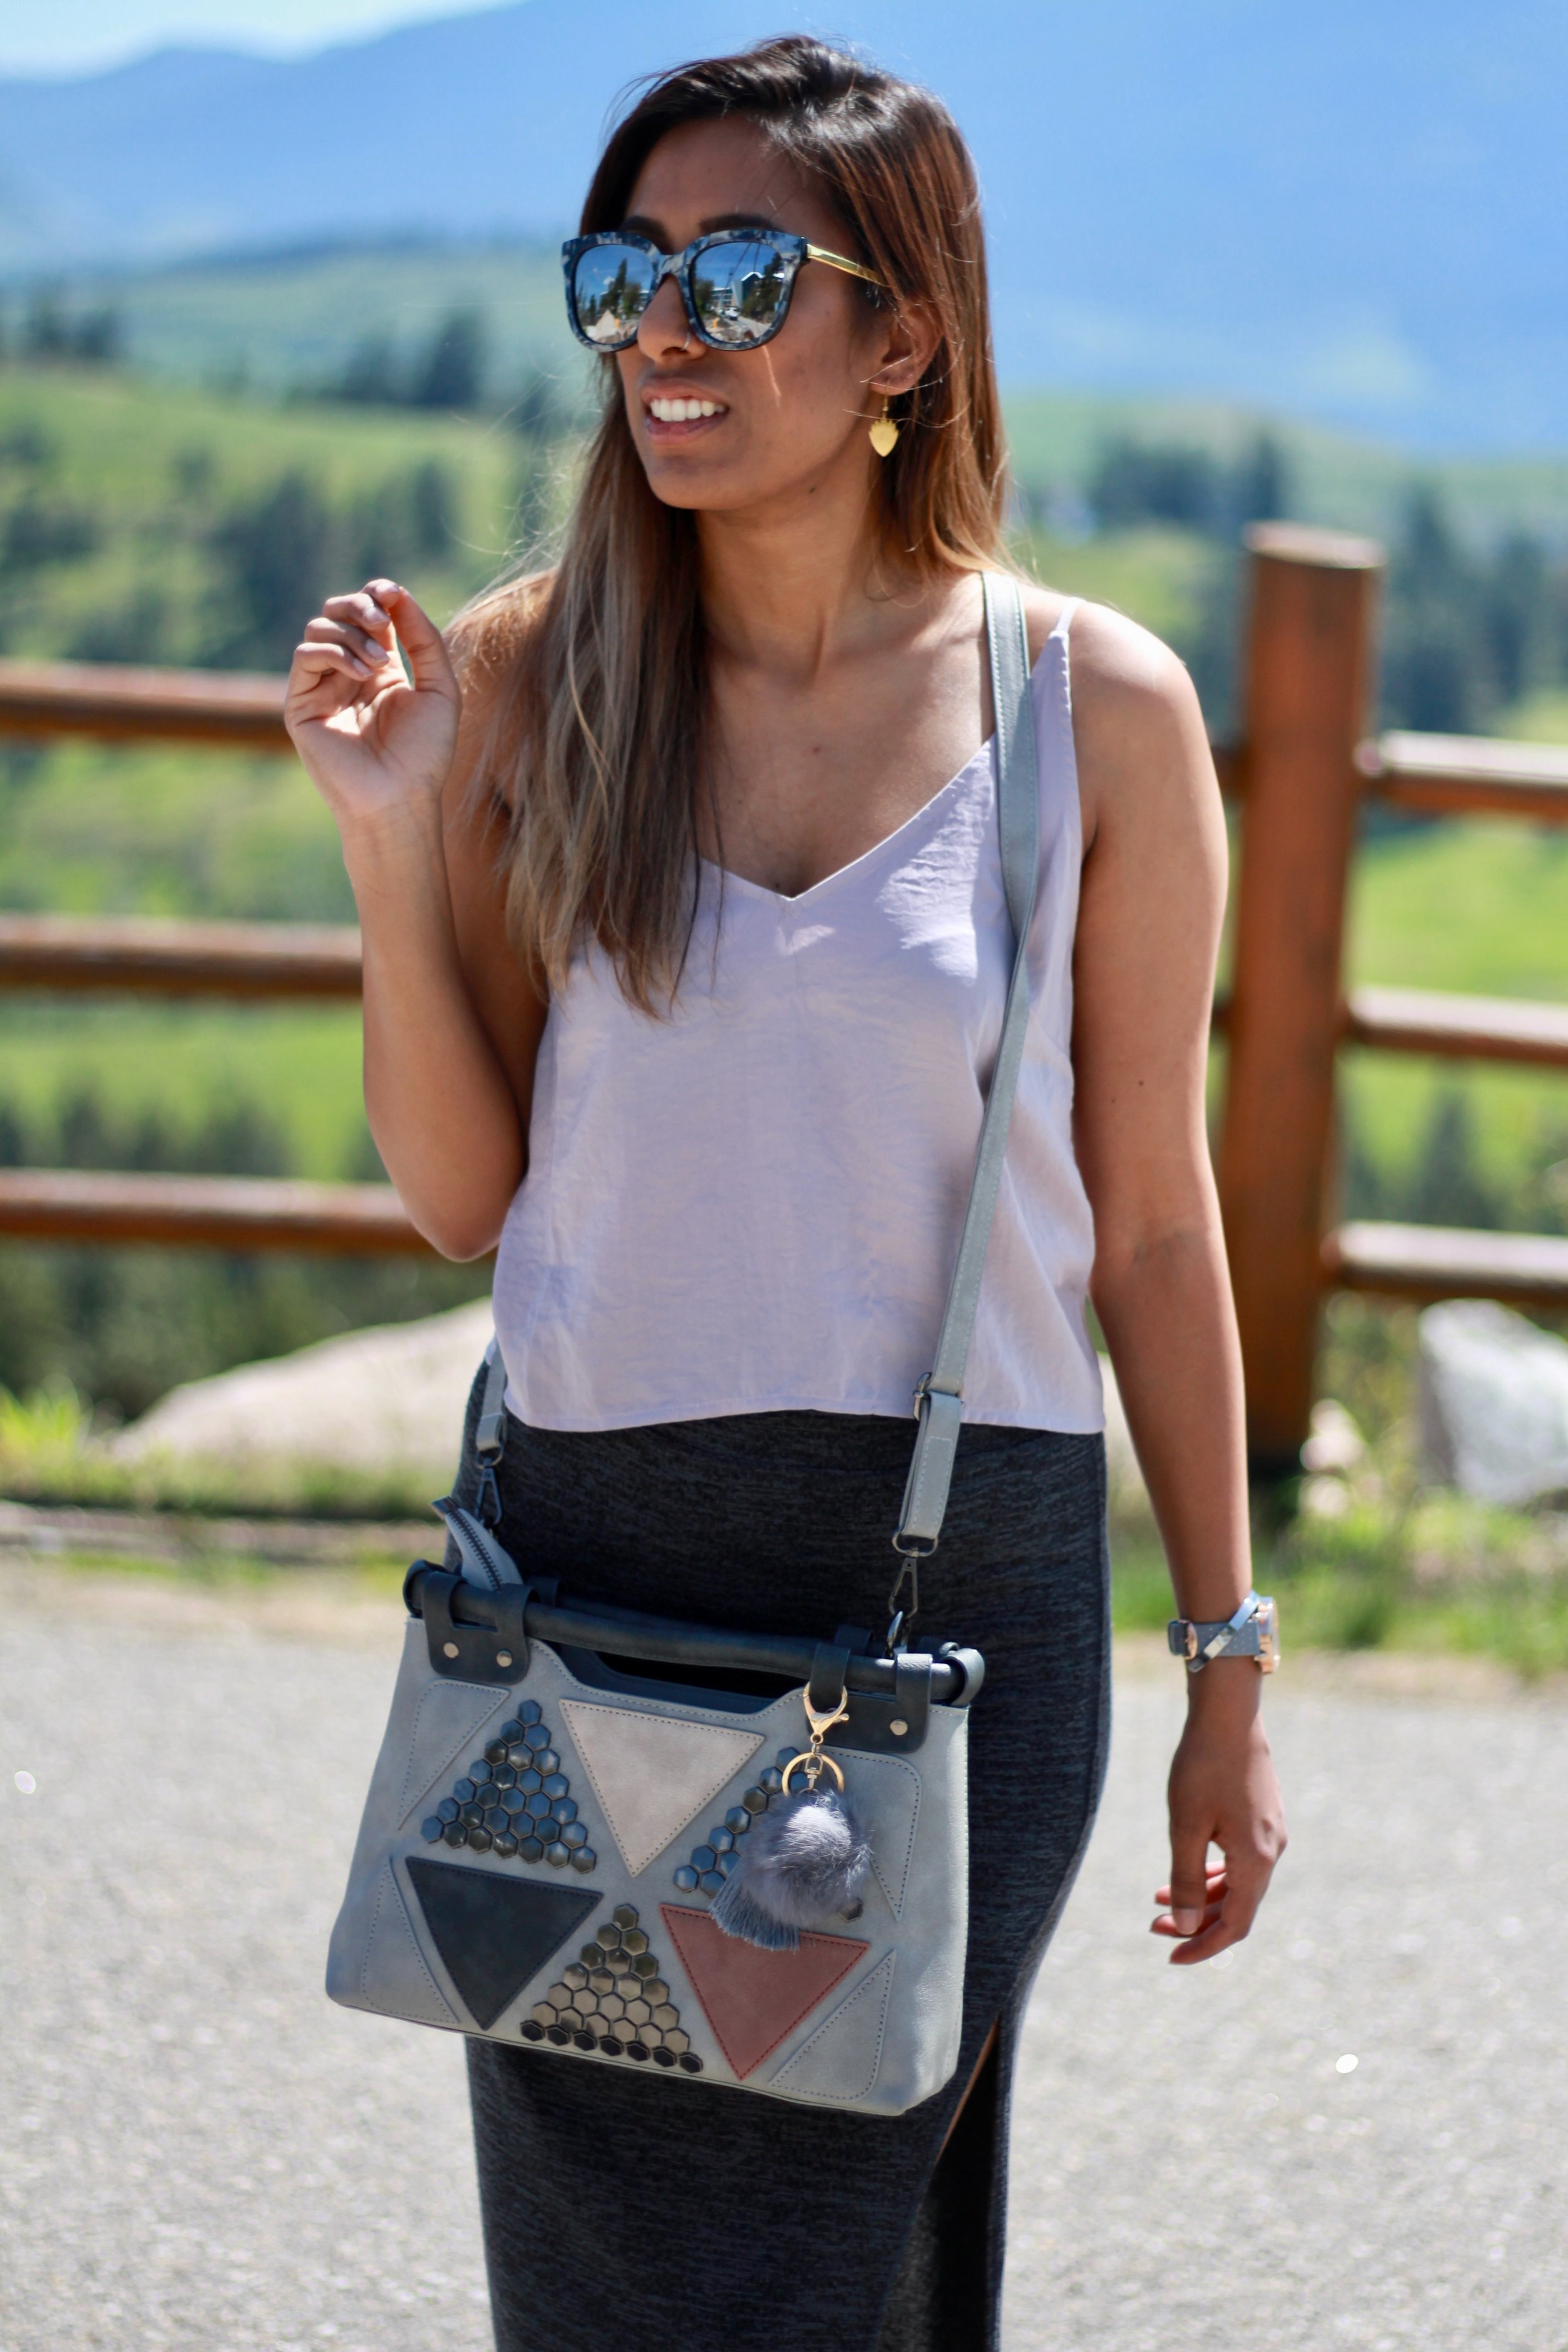 purse sunglasses sunshine